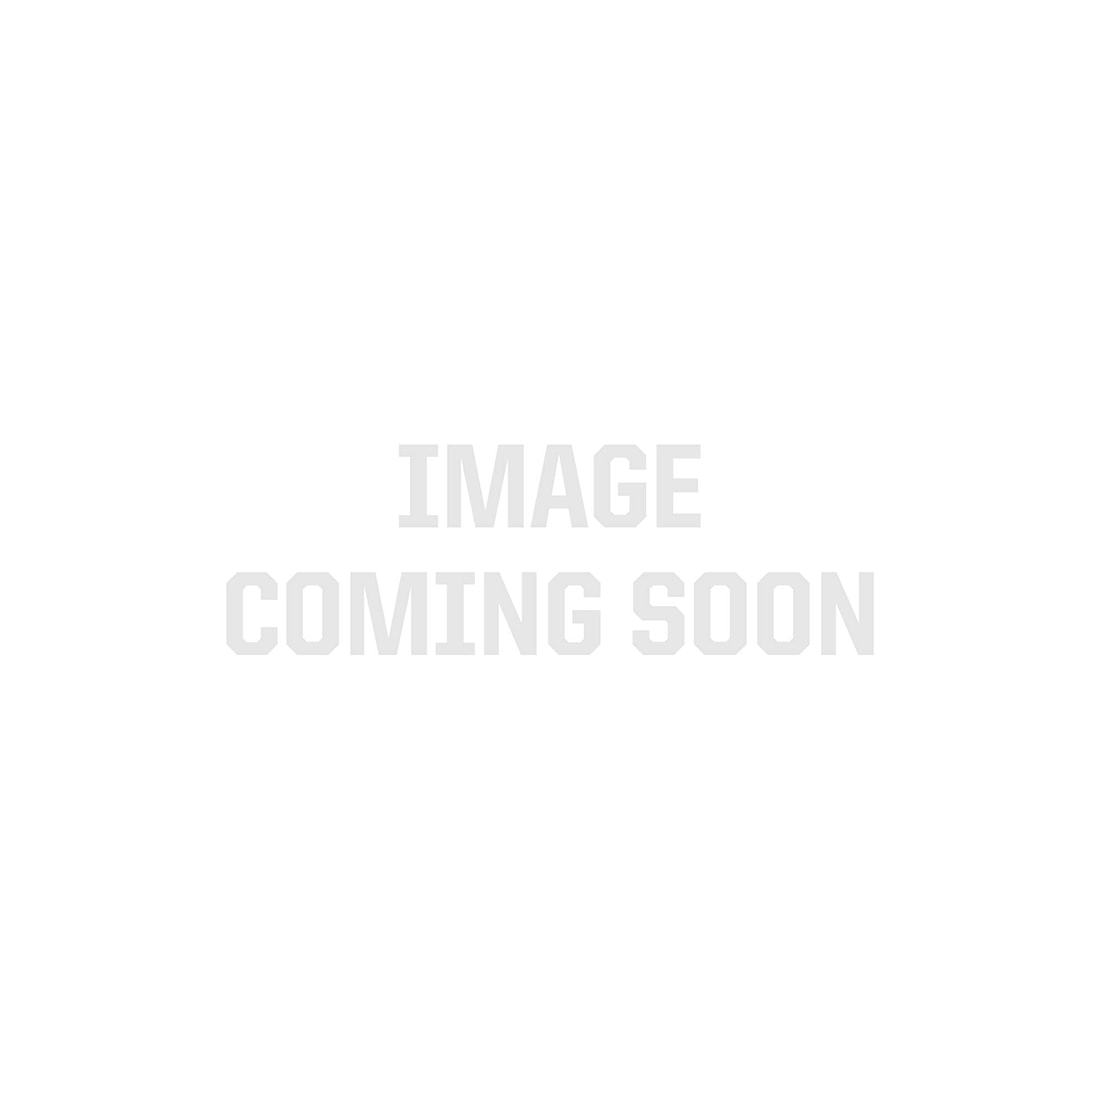 Blue 2835 CurrentControl Bendable ZigZag LED Strip Light, 60/m, 8mm wide, Sample Kit